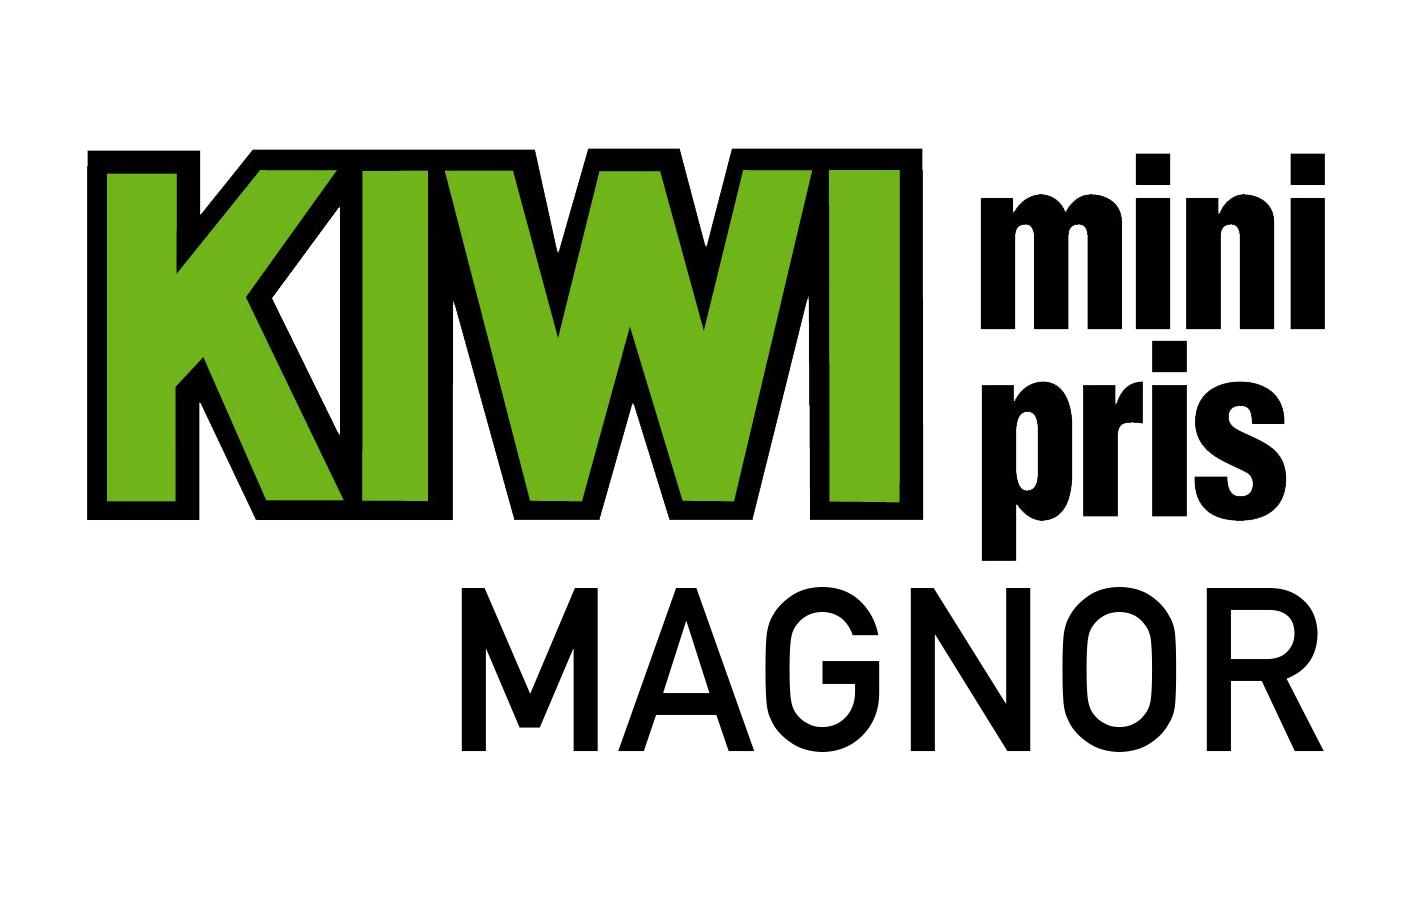 Kiwi Magnor